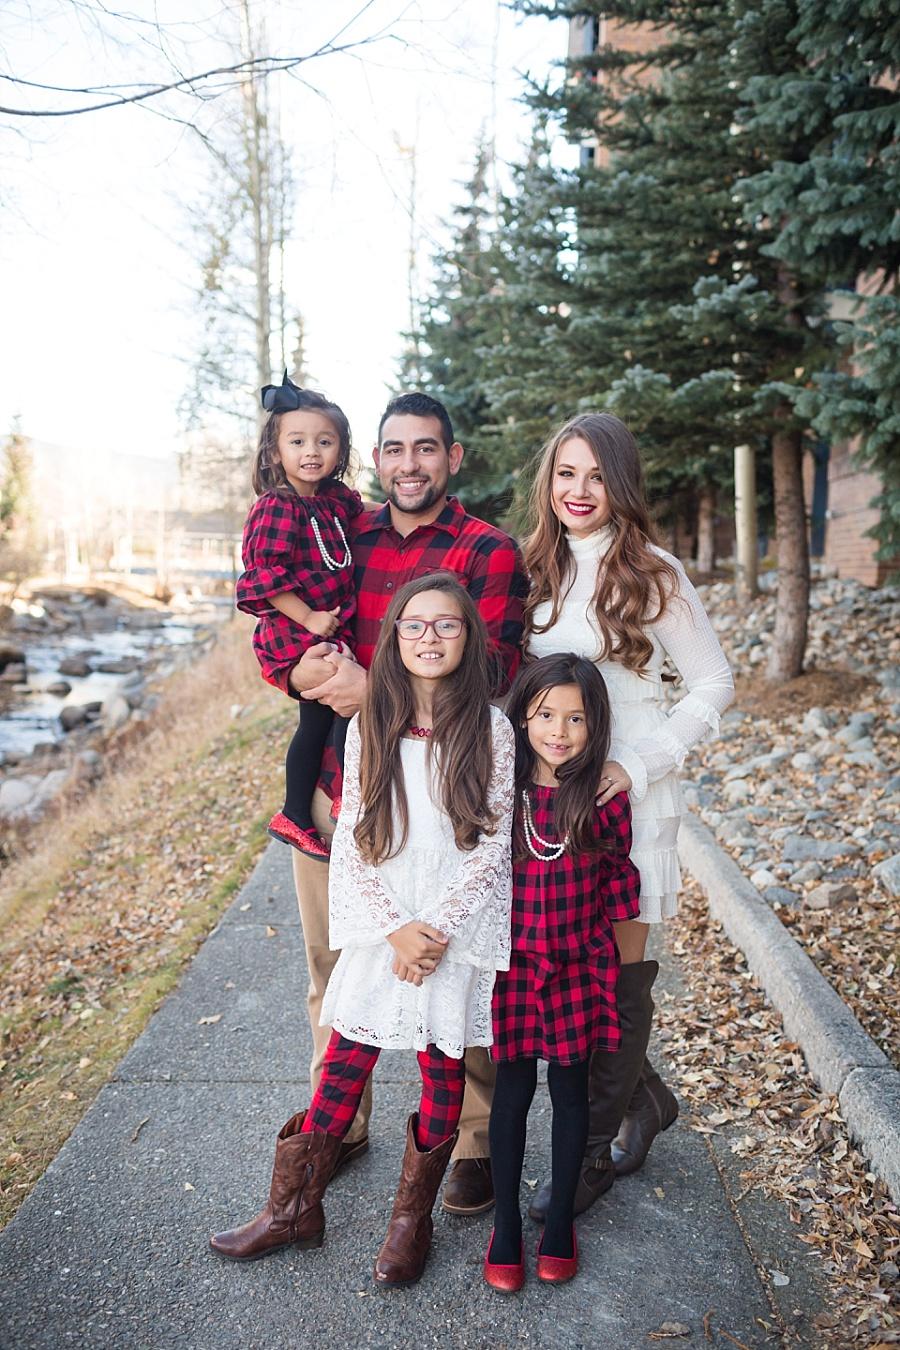 Stacy Anderson Photography Breckenridge Denver Boulder Vail Colorado Travel Lifestyle Elopement Vow renewal Family Wedding Photographer_0000.jpg